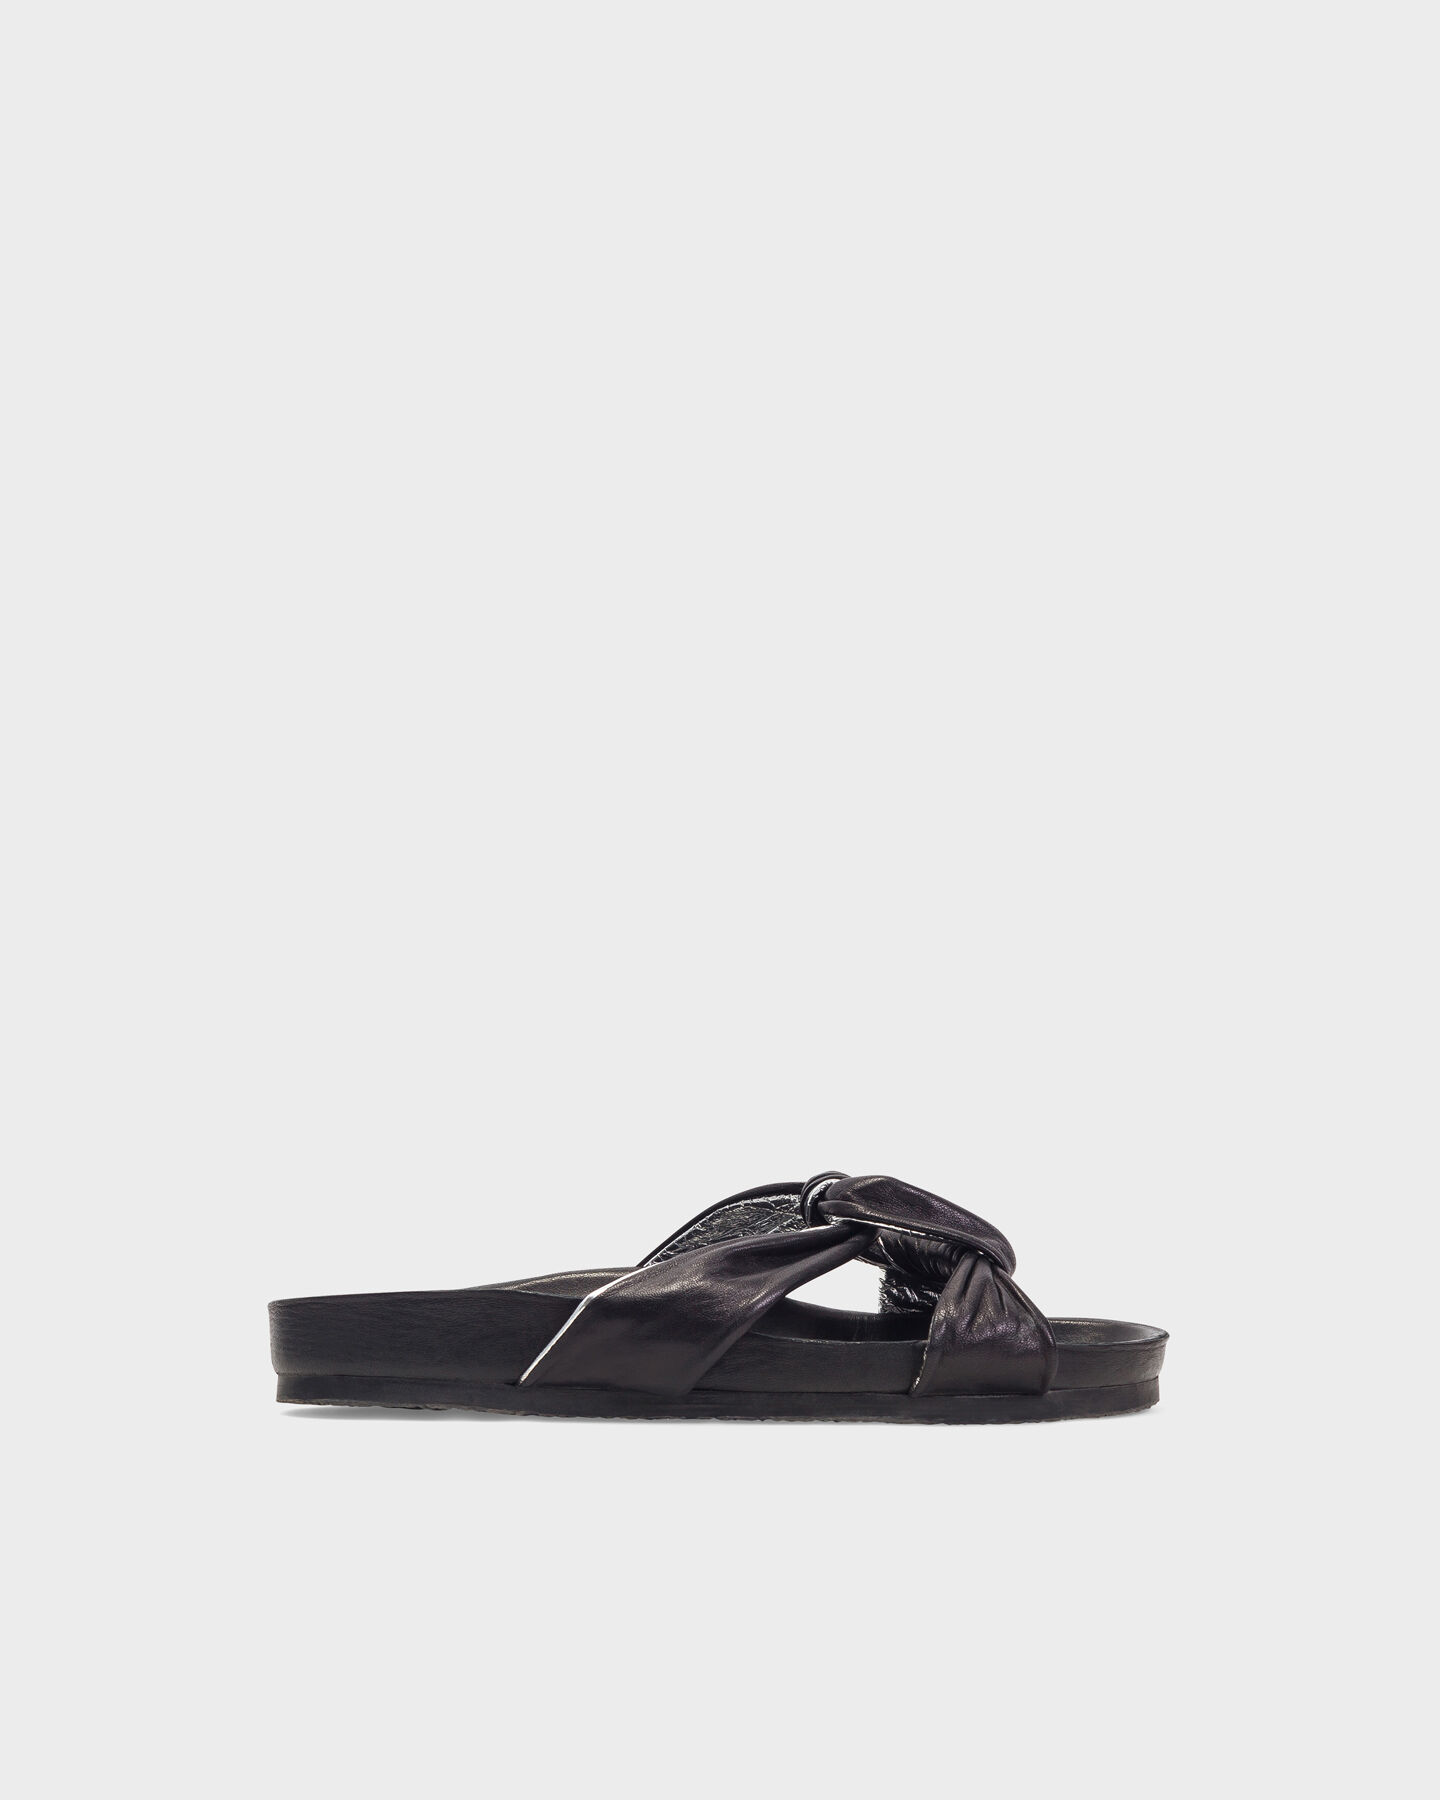 IRO Woman Leather Slides Size 38 DV2ezkvL